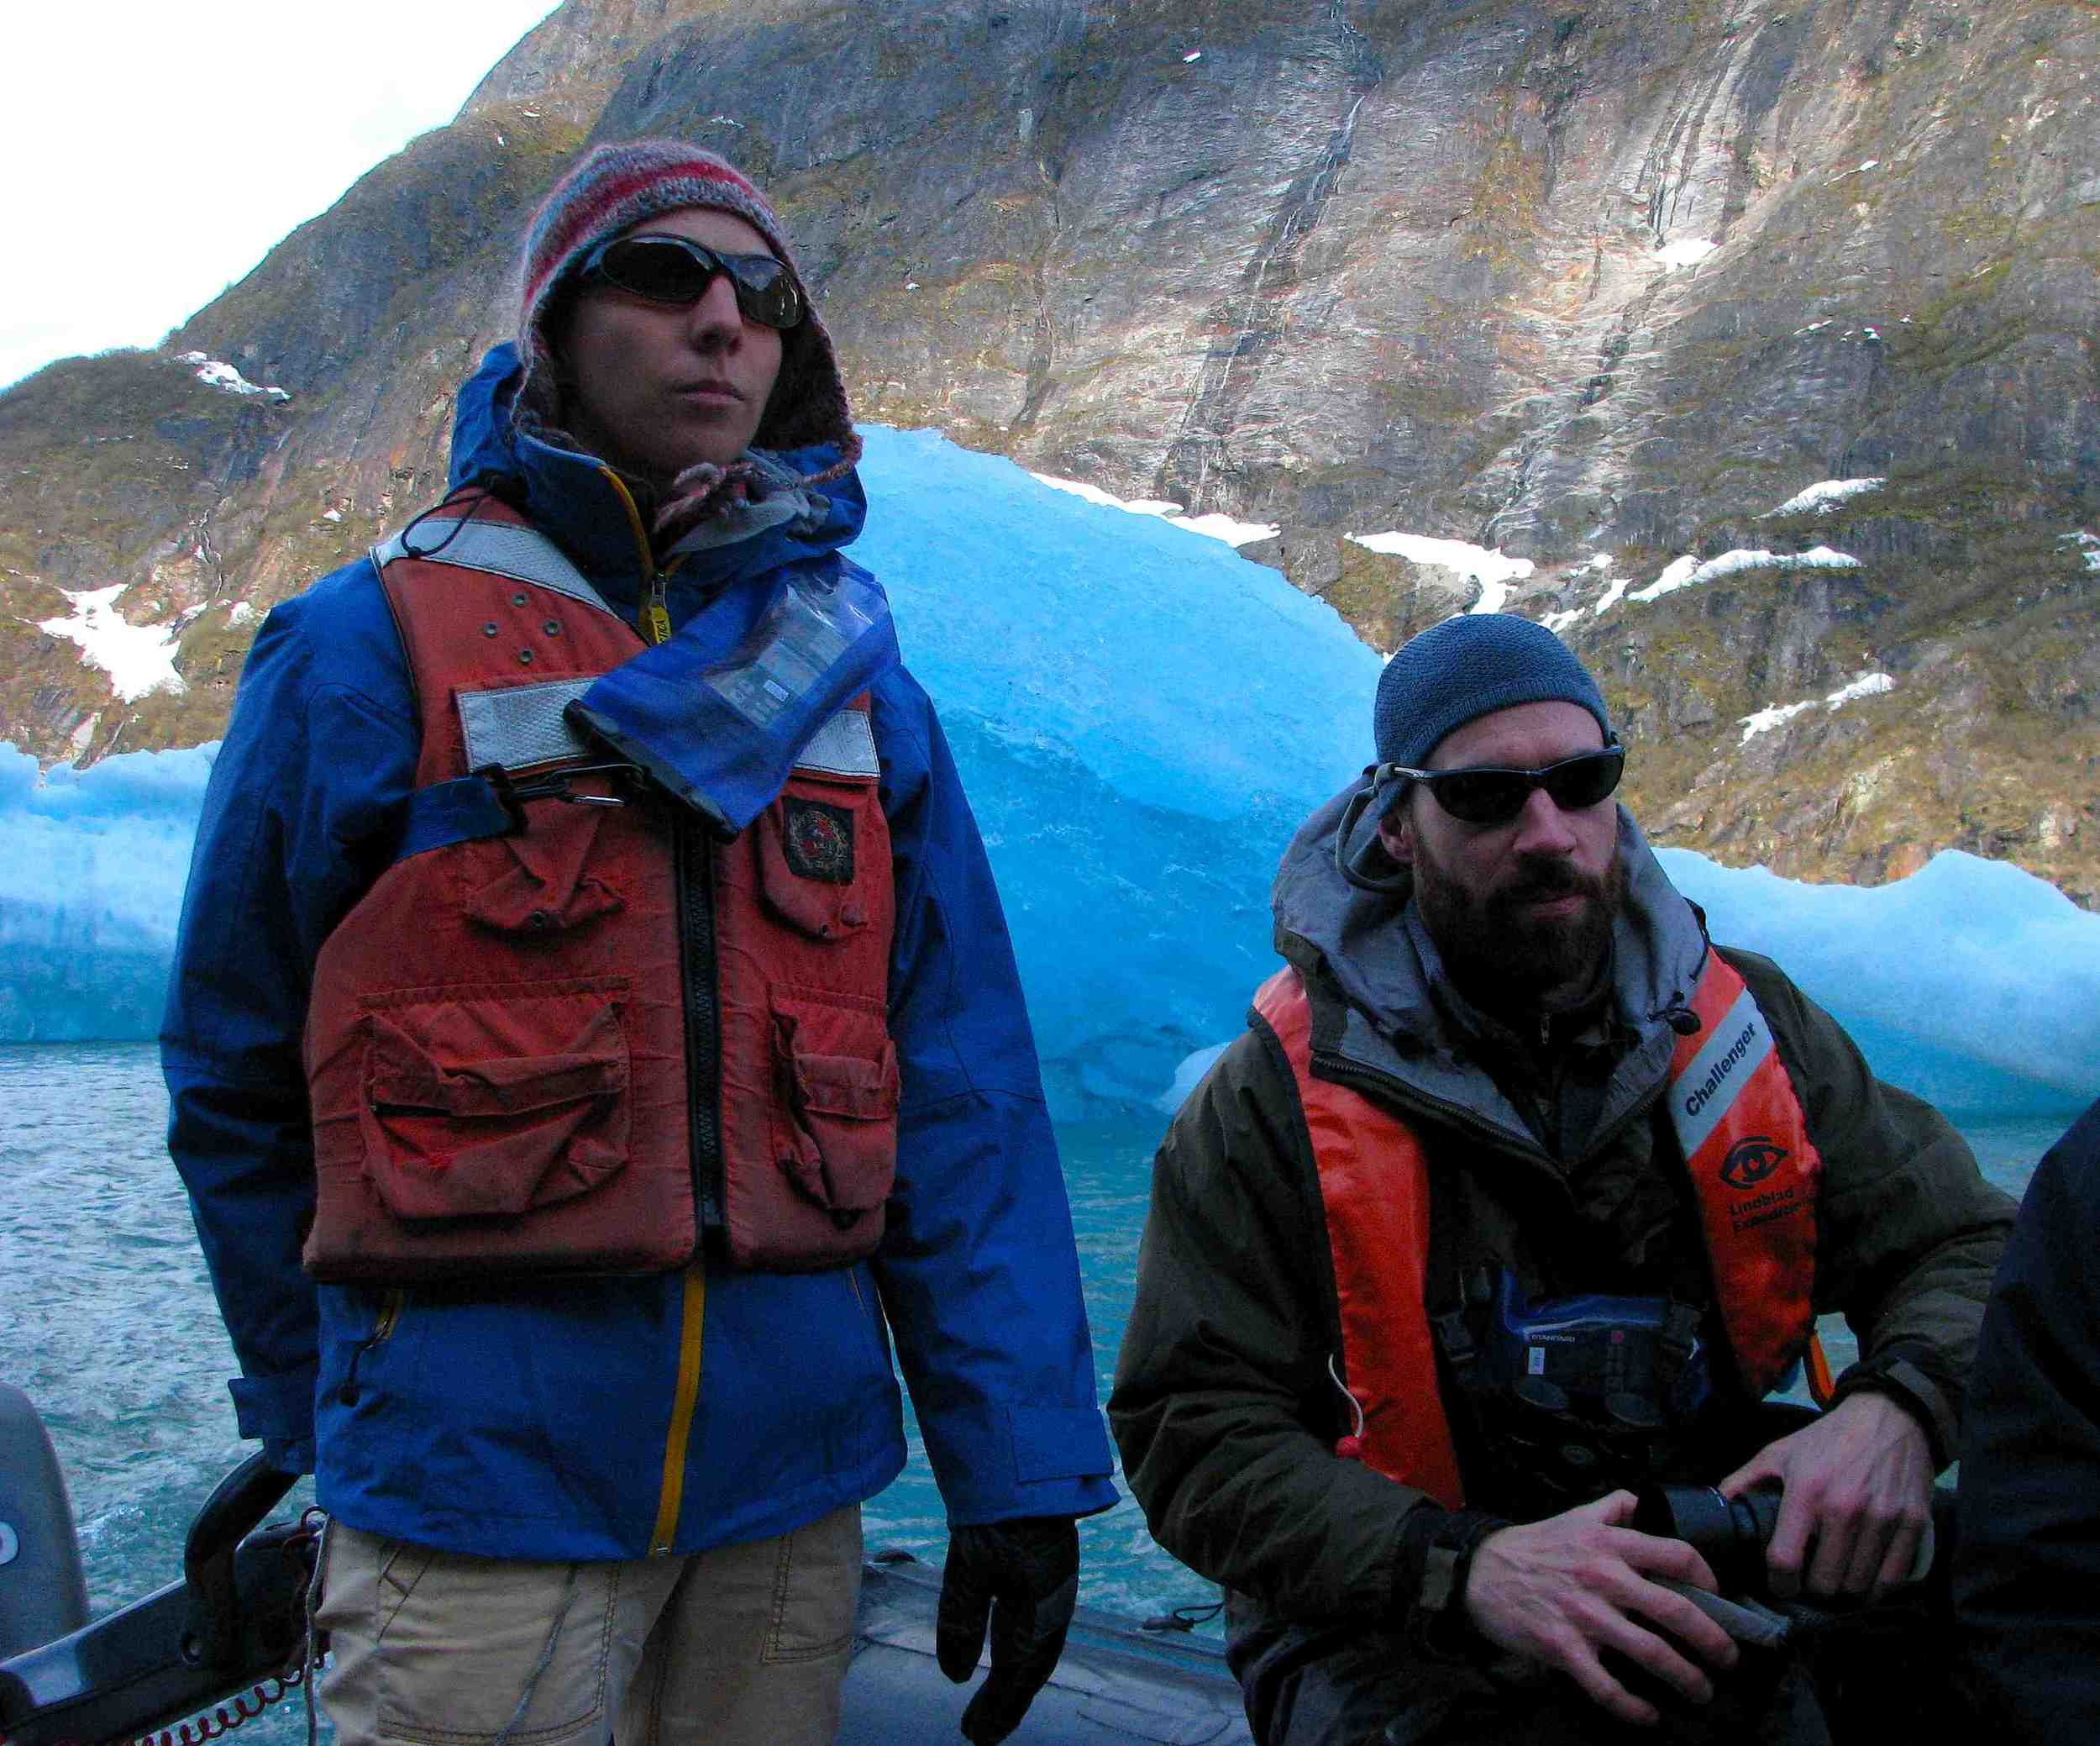 Jen and Doug among the blue icebergs of Southeast Alaska. Photo: Laura Ivill